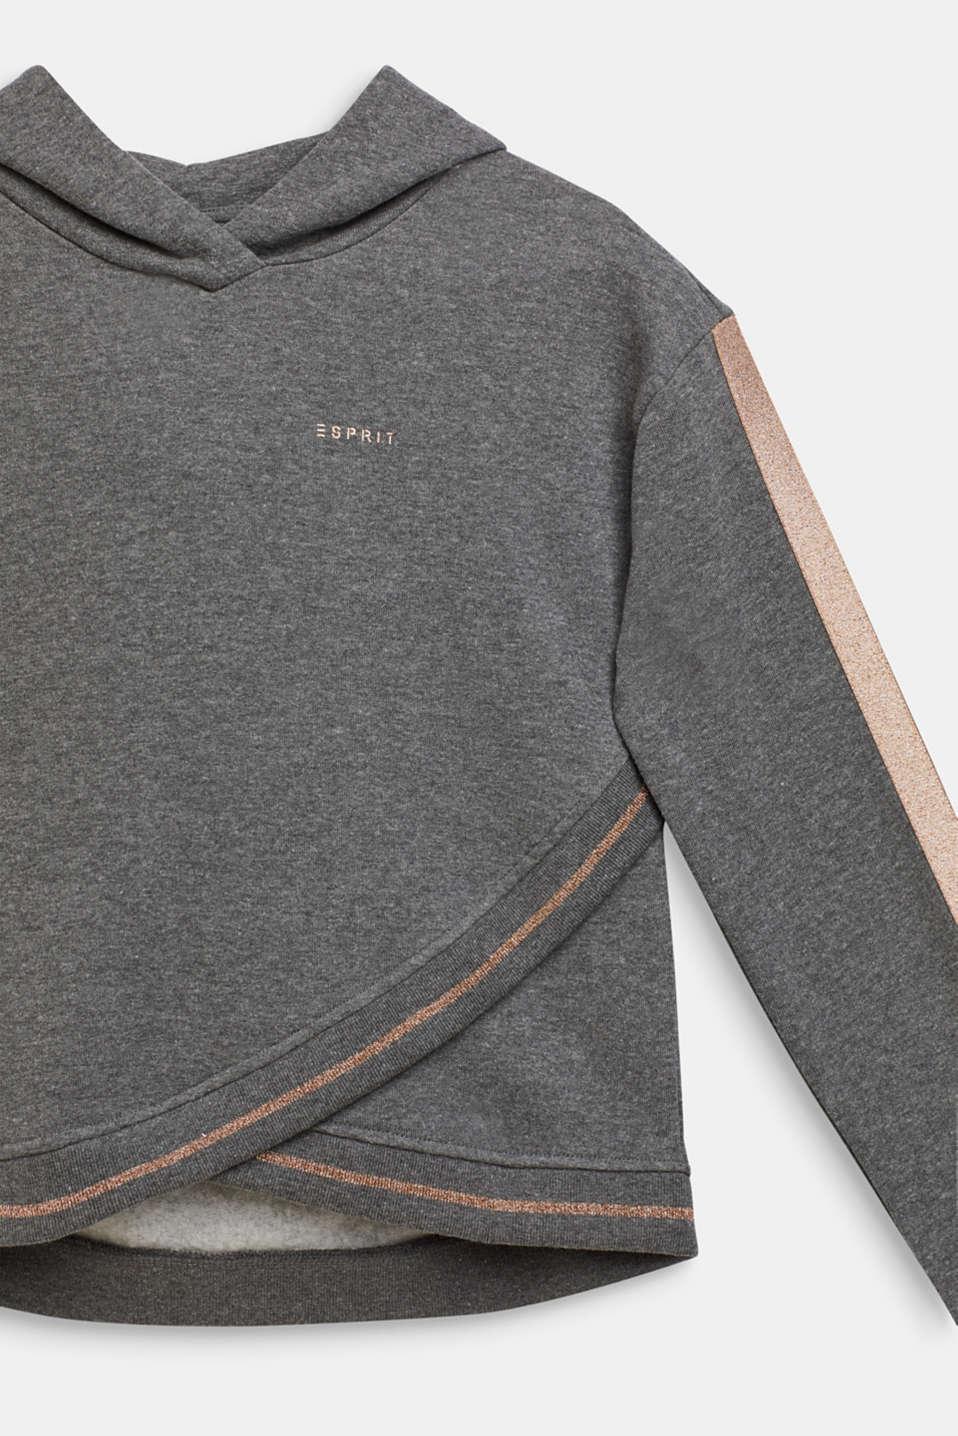 Sweatshirt fabric hoodie with glitter details, LCDARK HEATHER G, detail image number 2